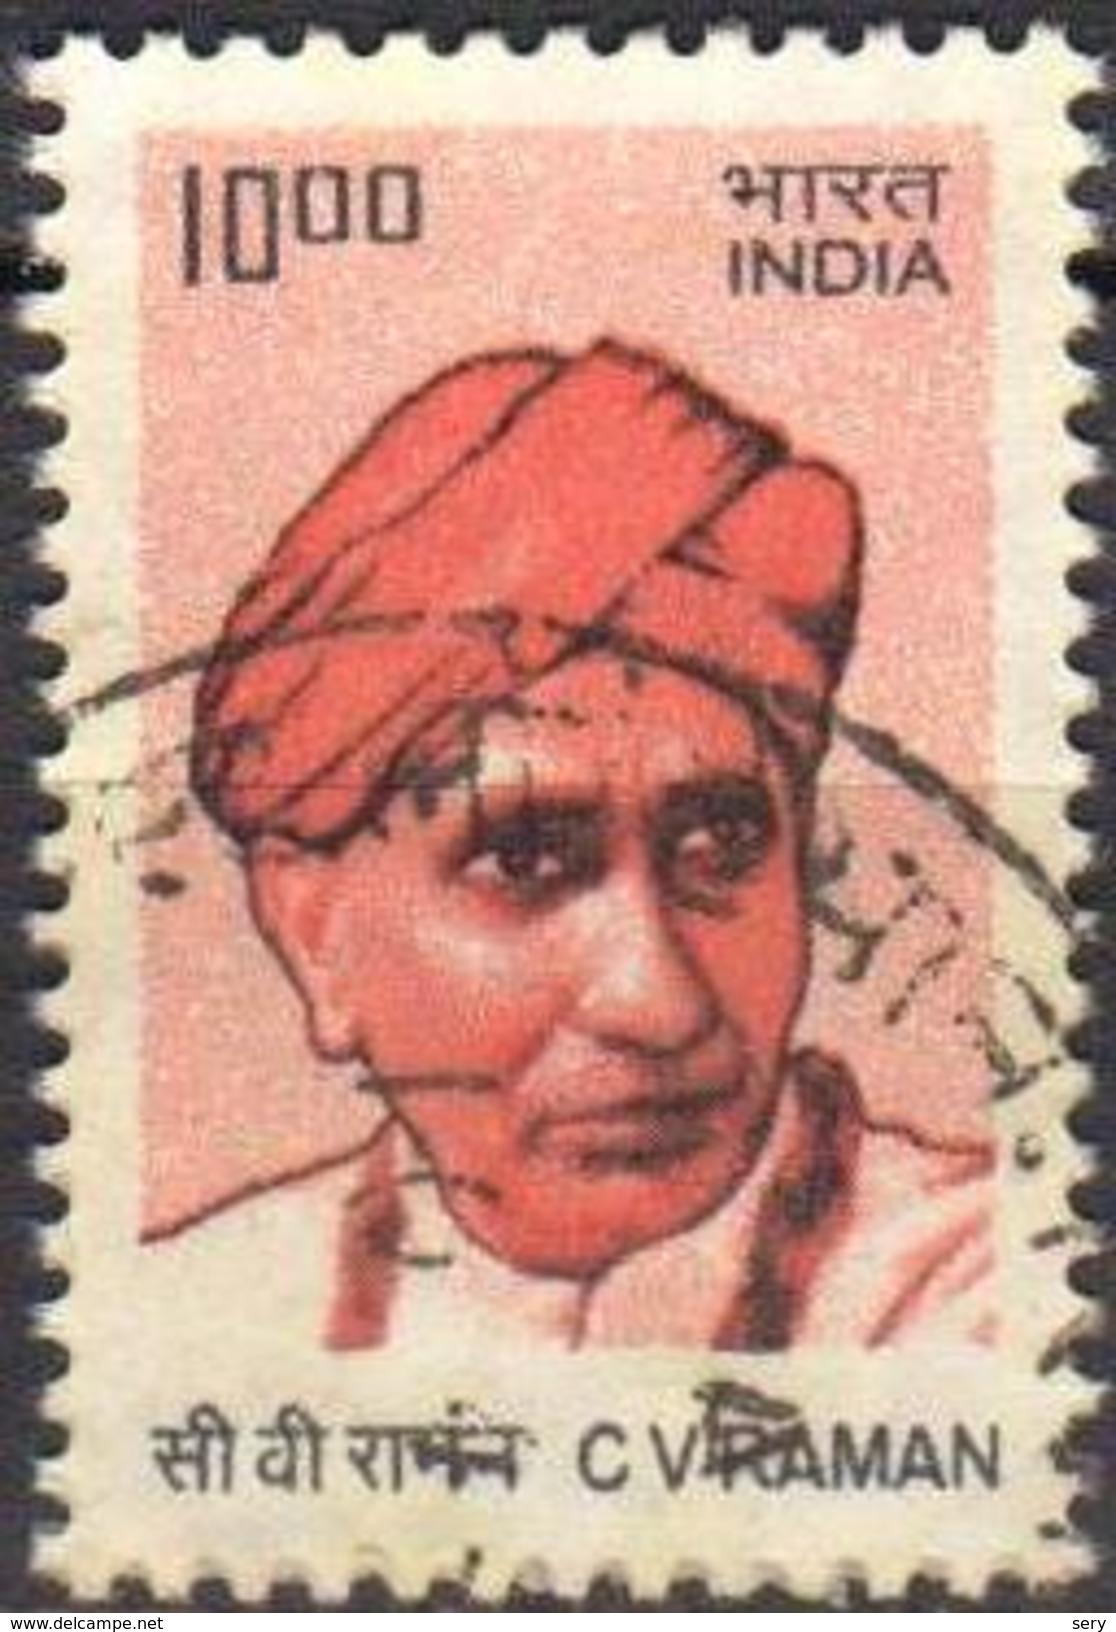 India 2010 1 V Used C. V. Raman Indian Physicist Nobel Prize Physics - Fisica